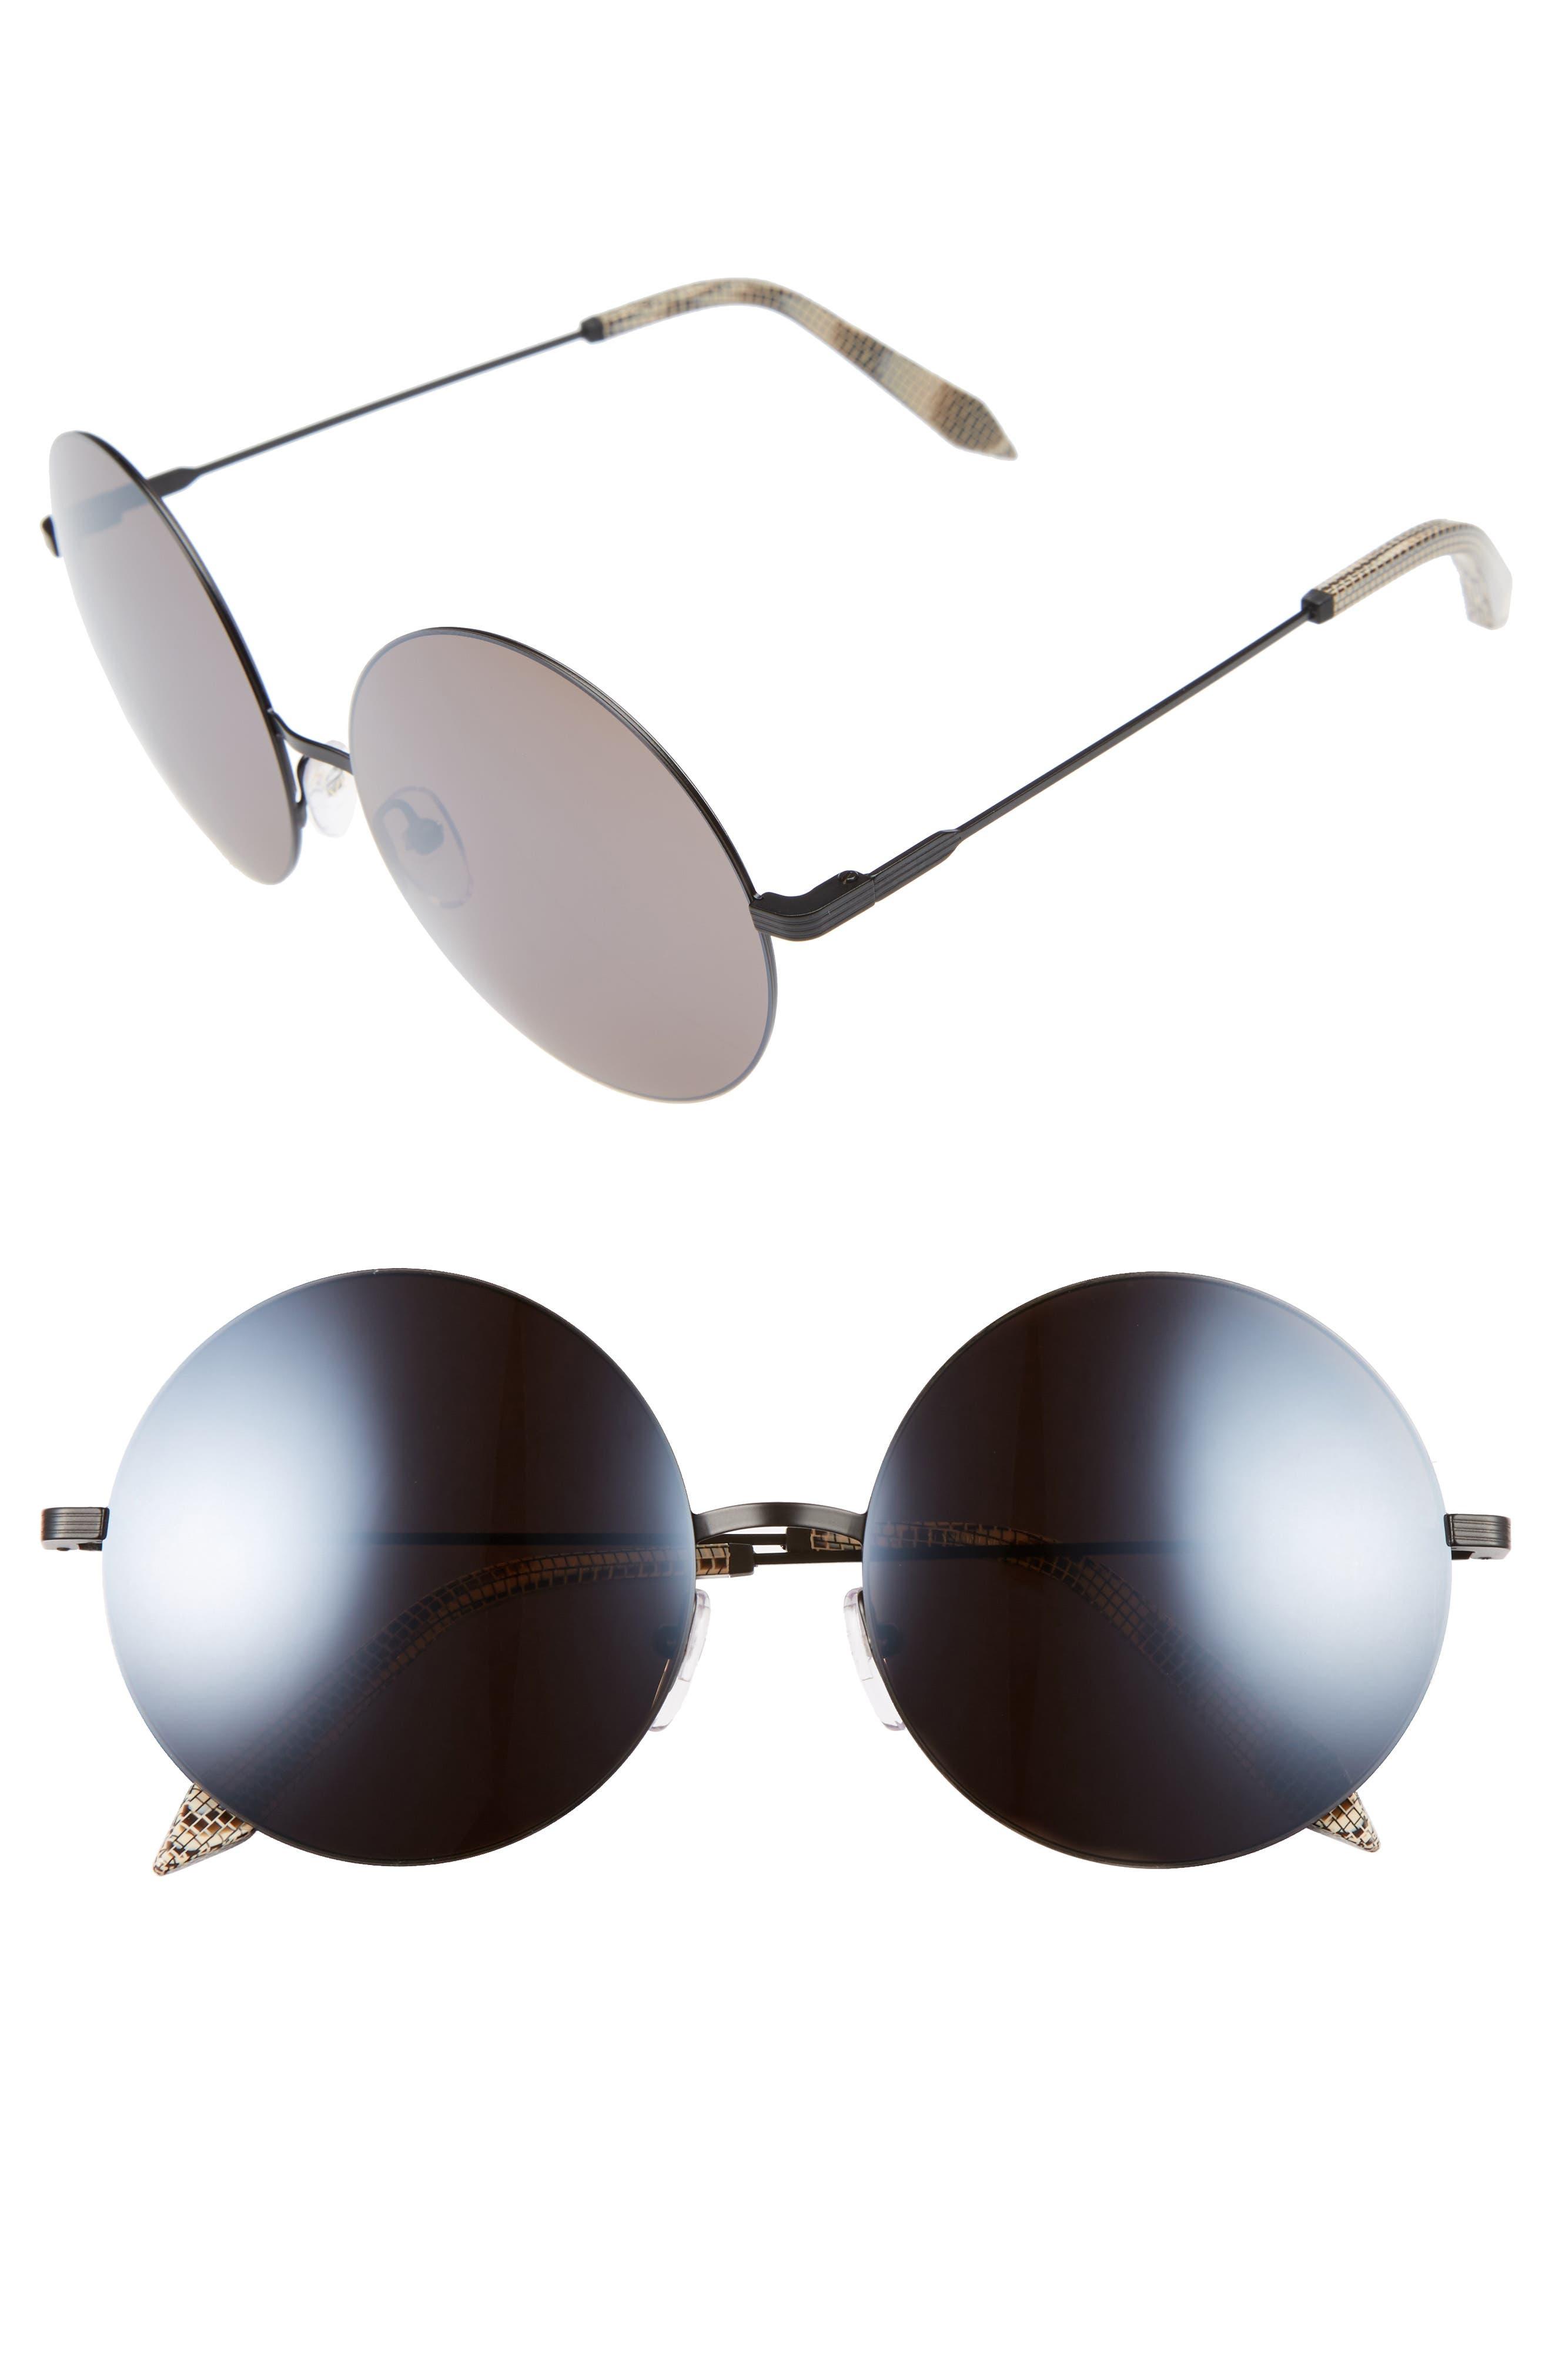 VICTORIA BECKHAM, Feather 58mm Round Sunglasses, Main thumbnail 1, color, BLACK/ CAVIAR MIRROR